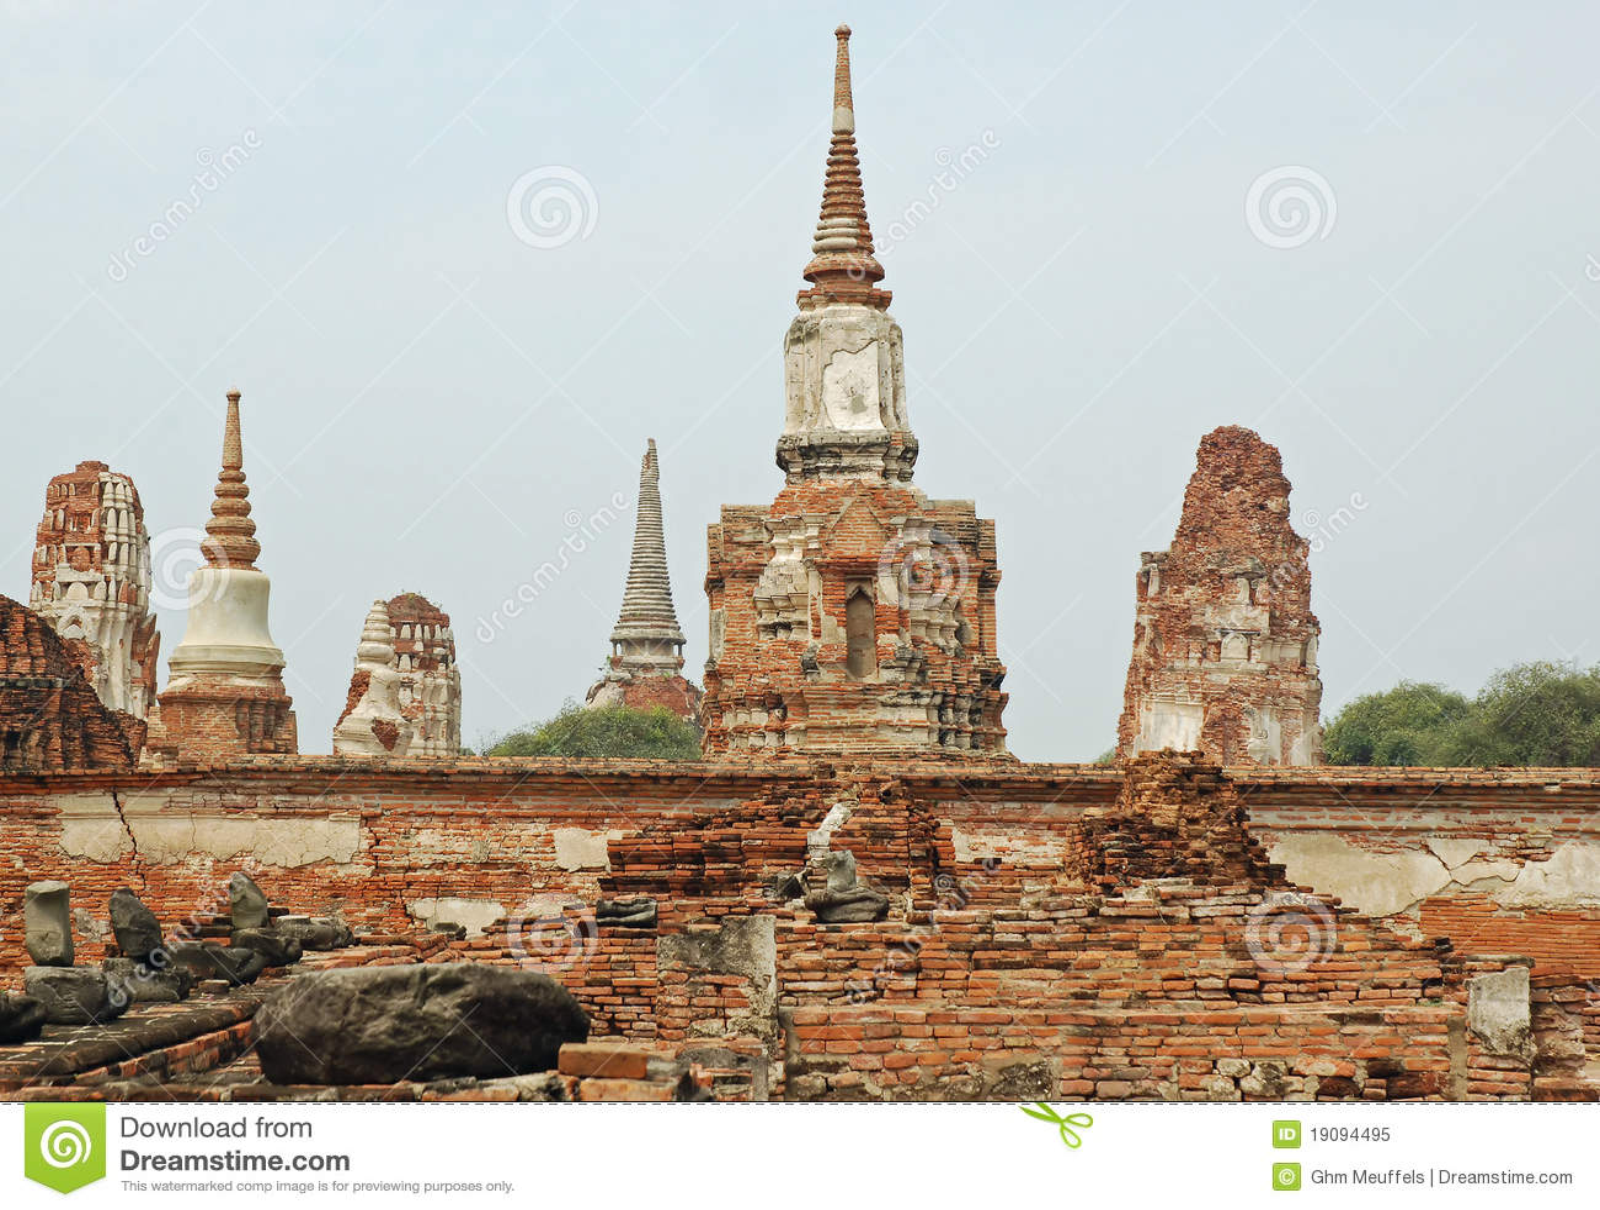 Ayutthaya - Wat Phra Sri Sanphet - Thailand